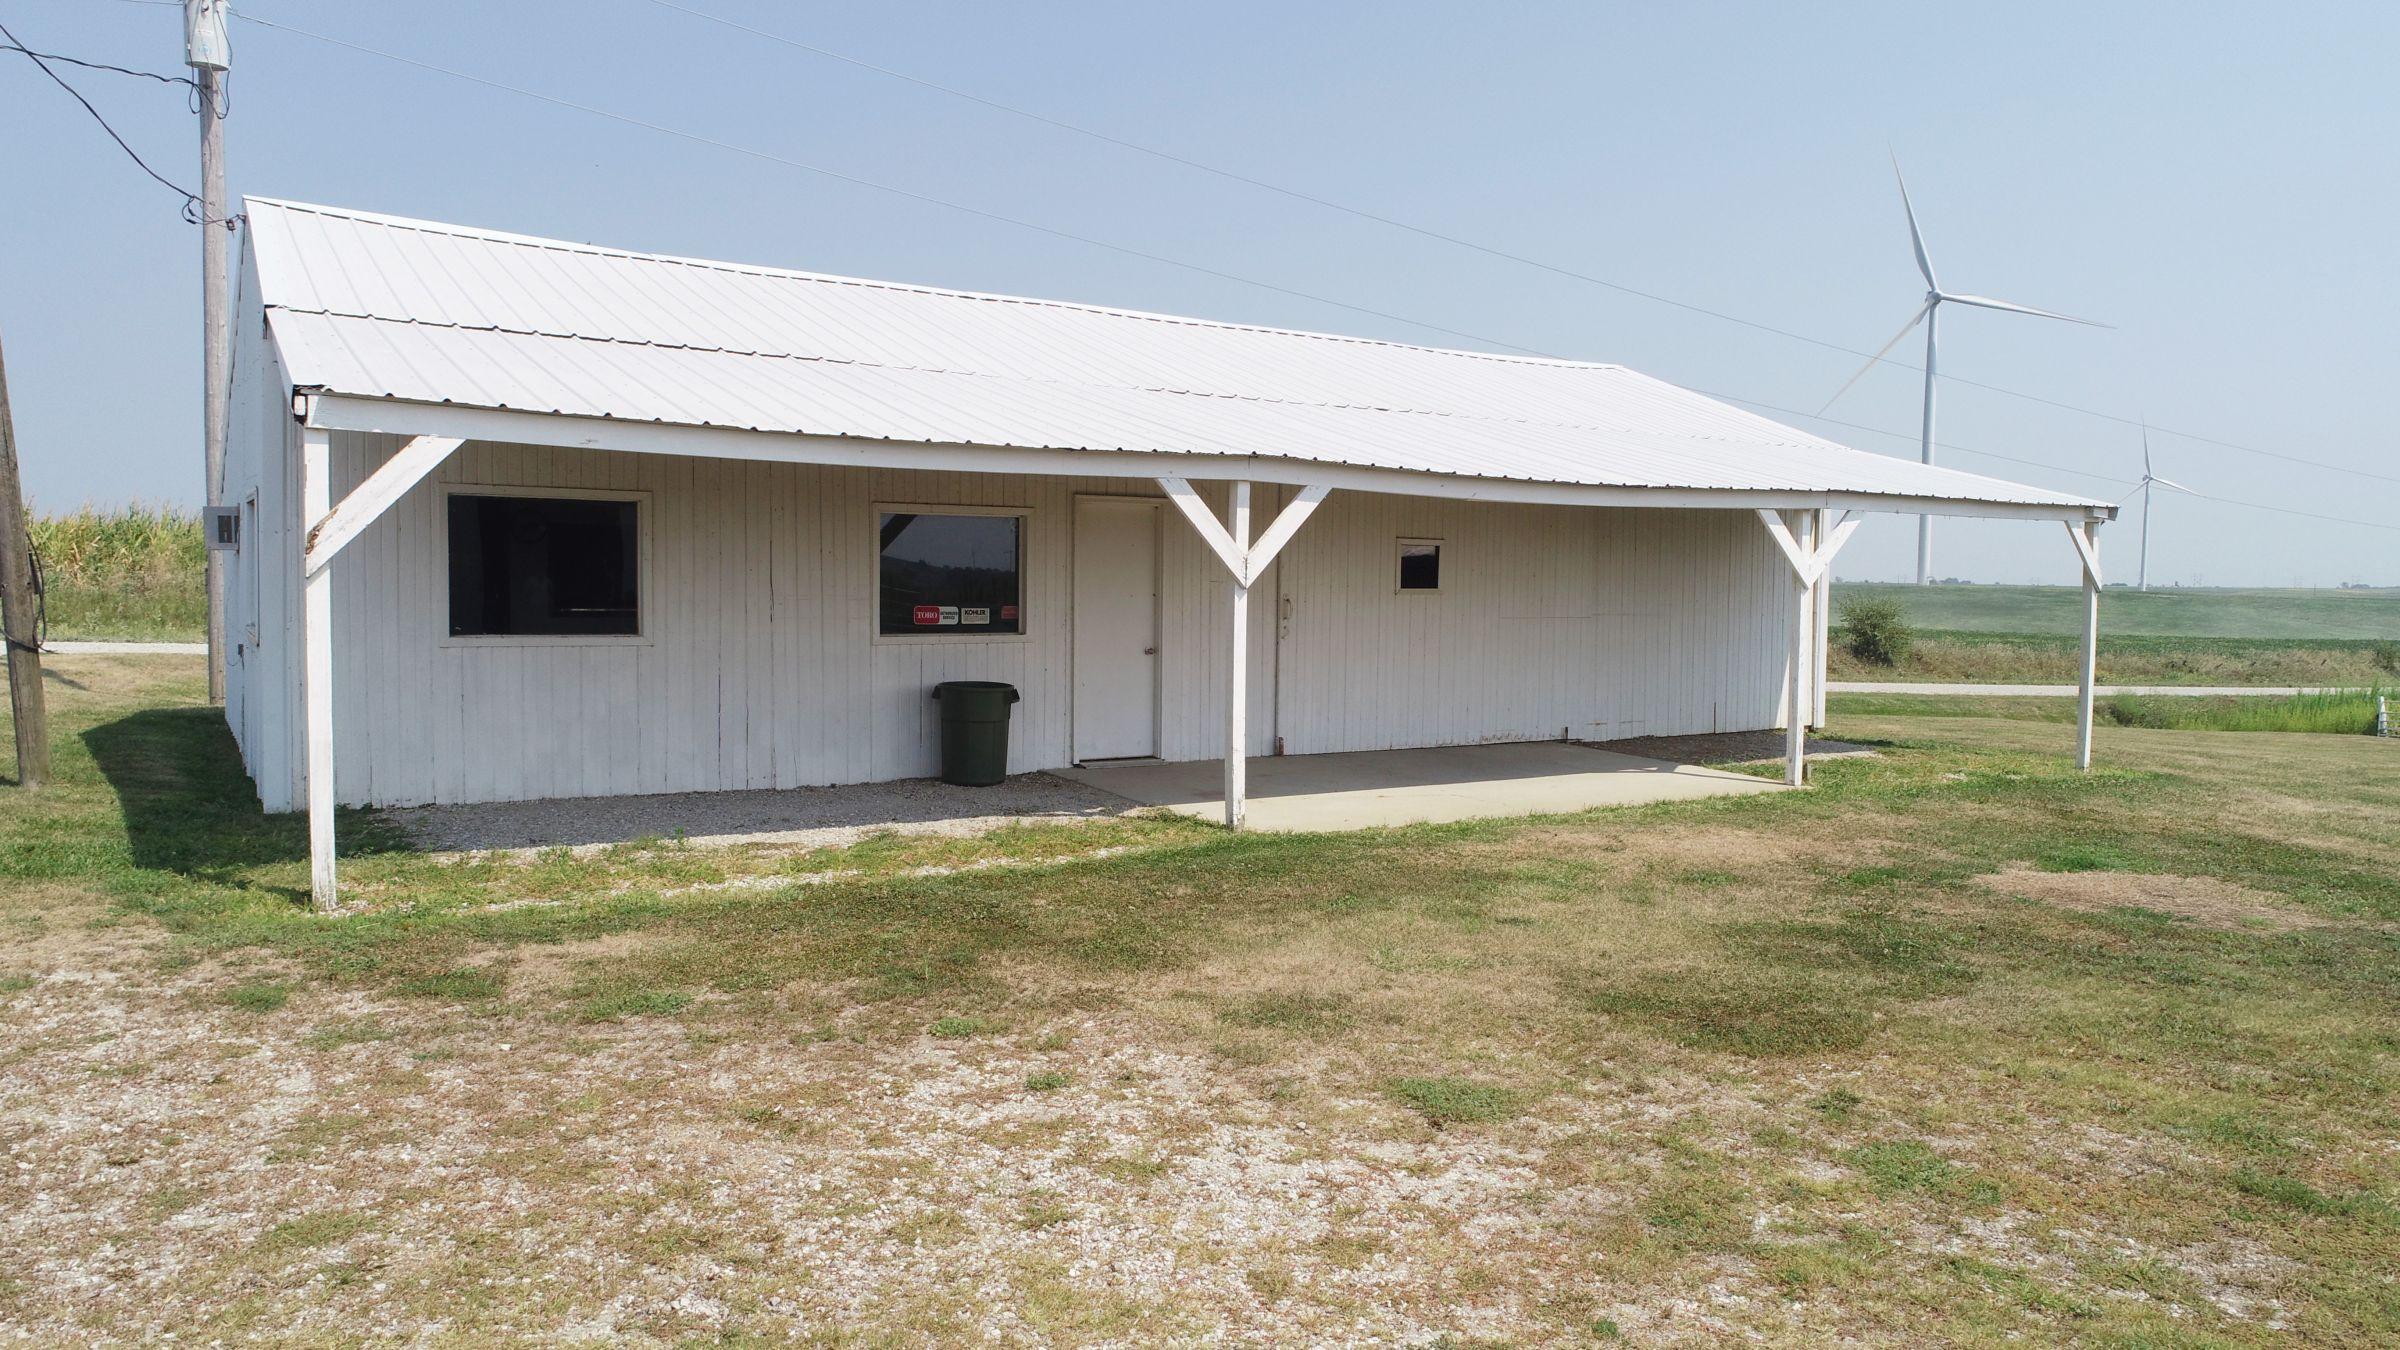 residential-land-poweshiek-county-iowa-5-acres-listing-number-15149-8-2020-08-28-201130.jpg